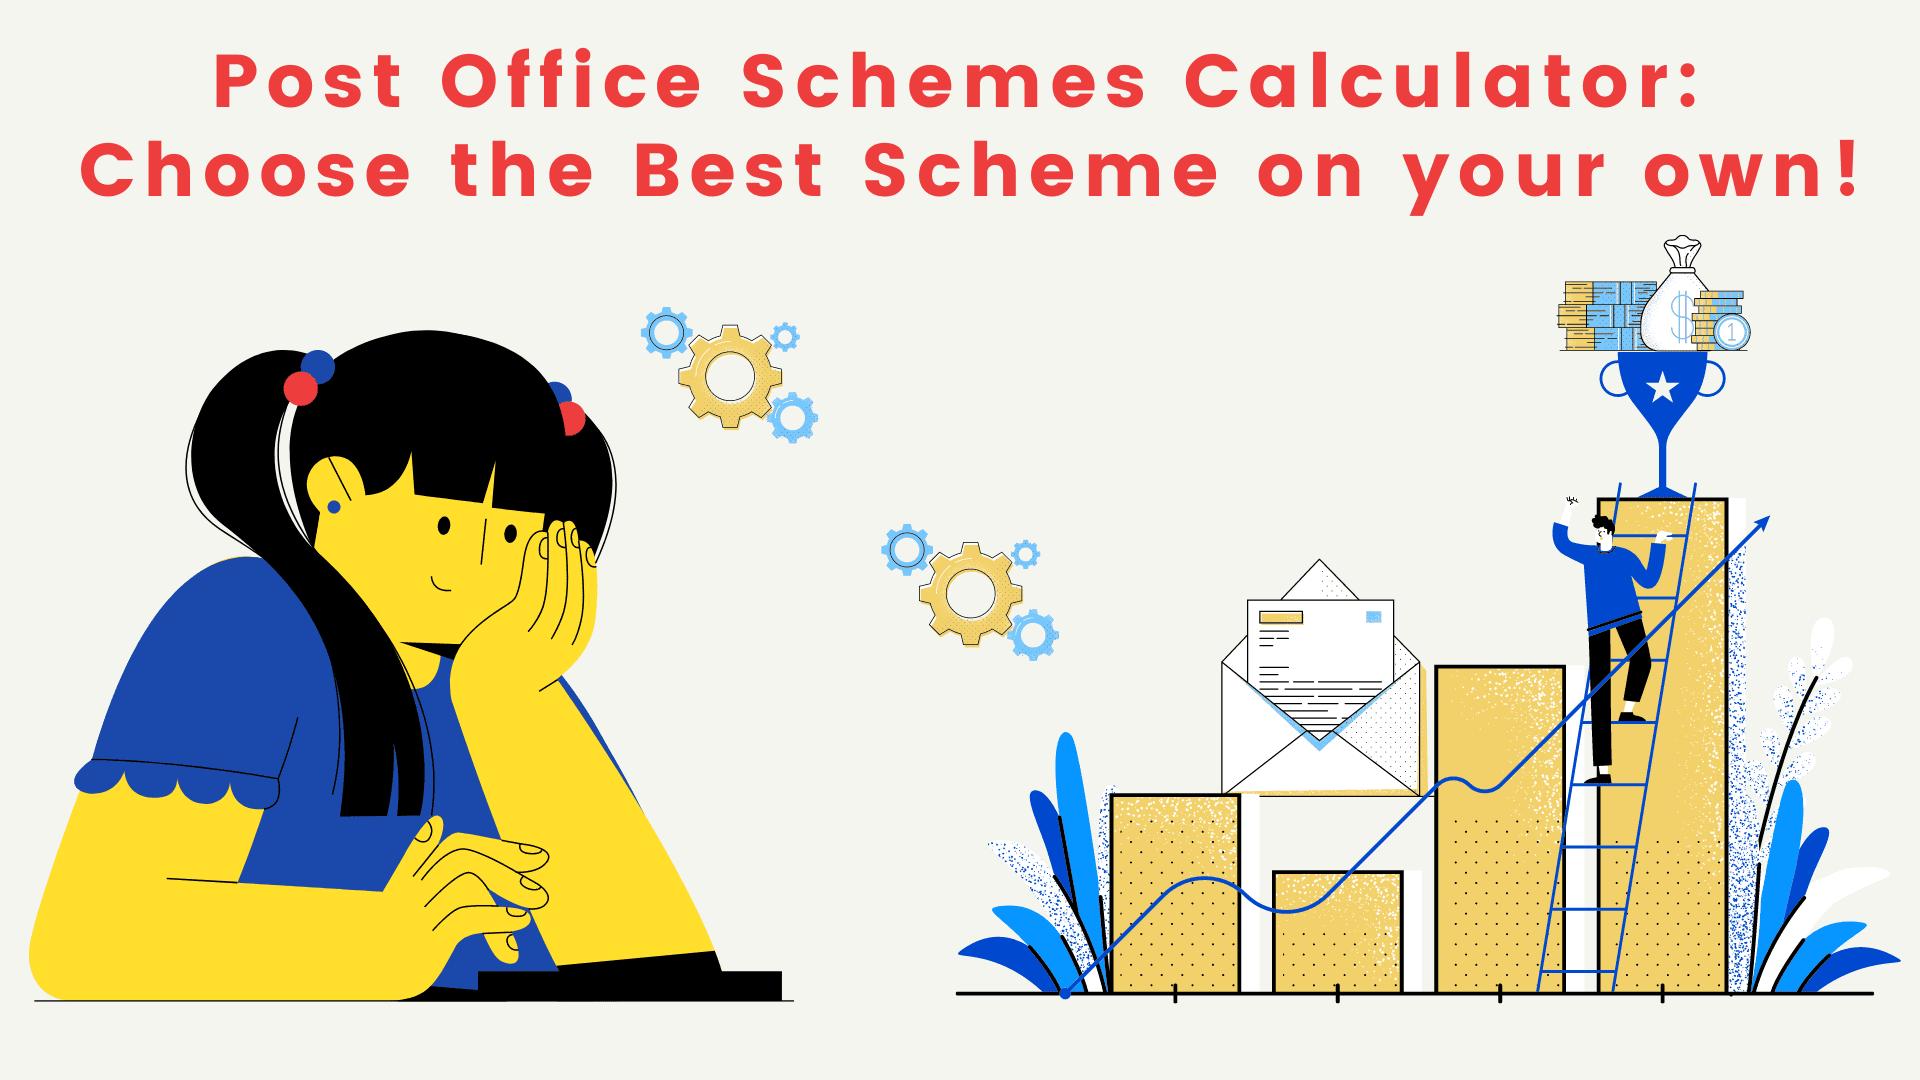 Post Office Schemes Calculator